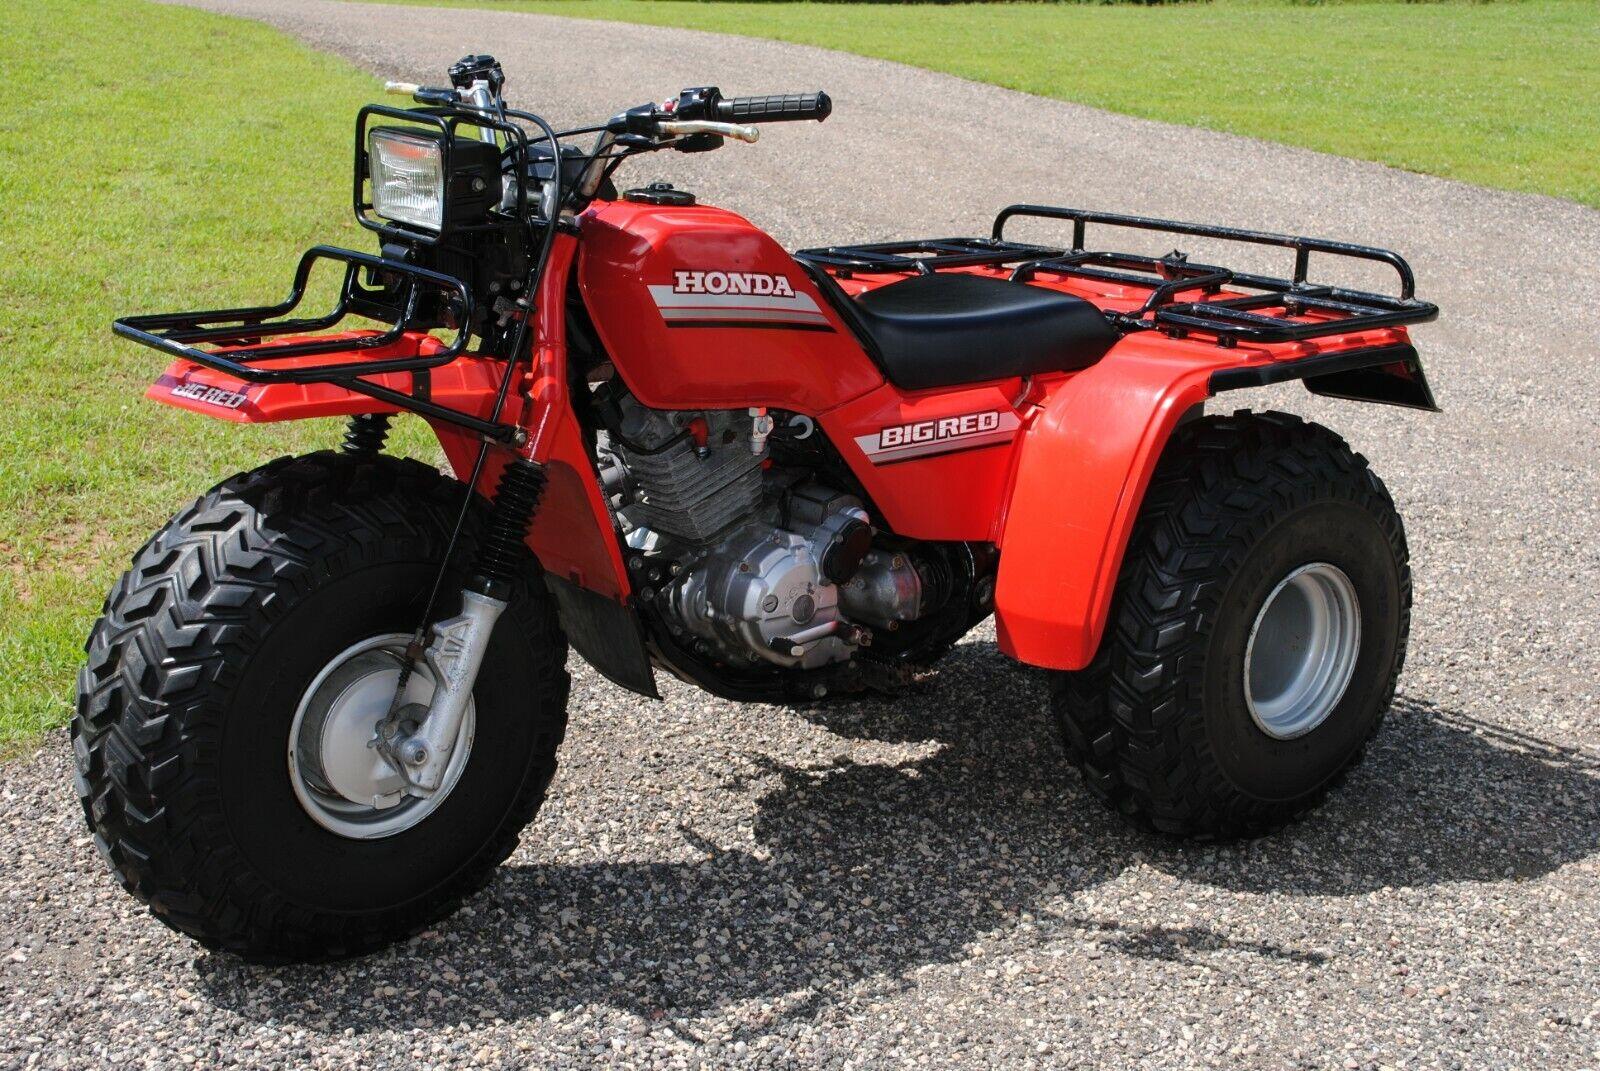 1985 Honda Big Red 250ES ATC ATV